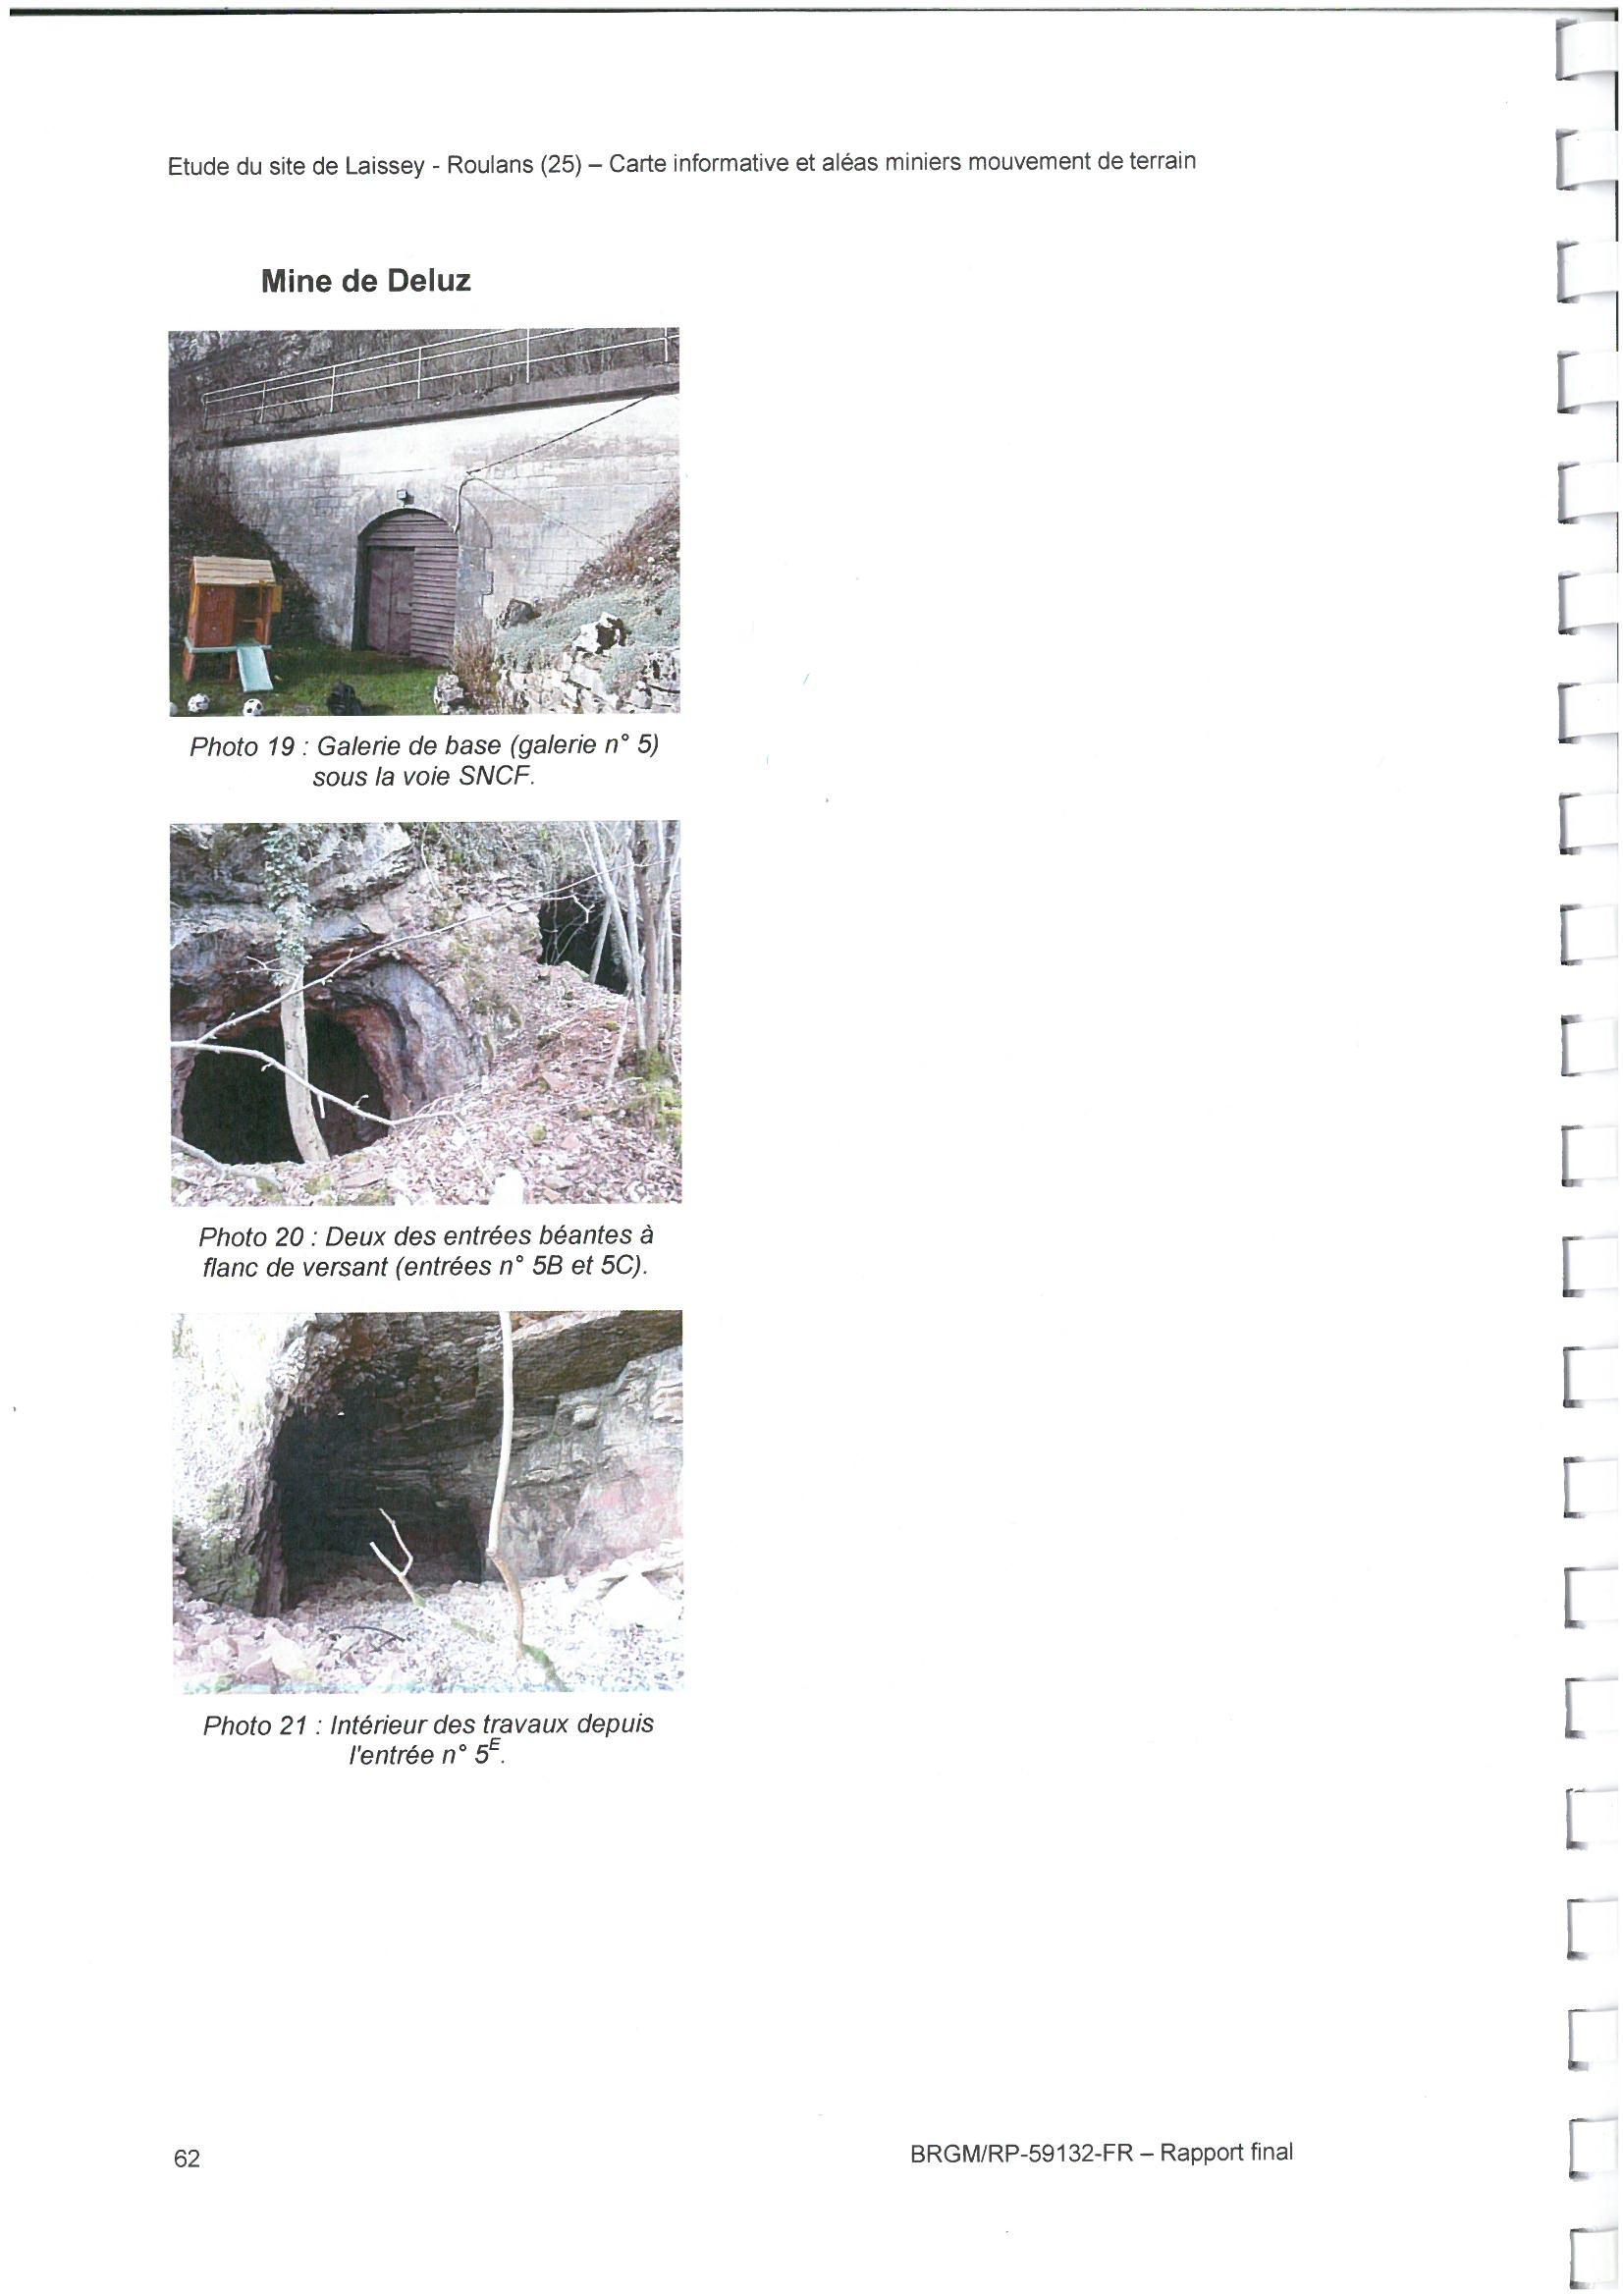 mines-photos-4